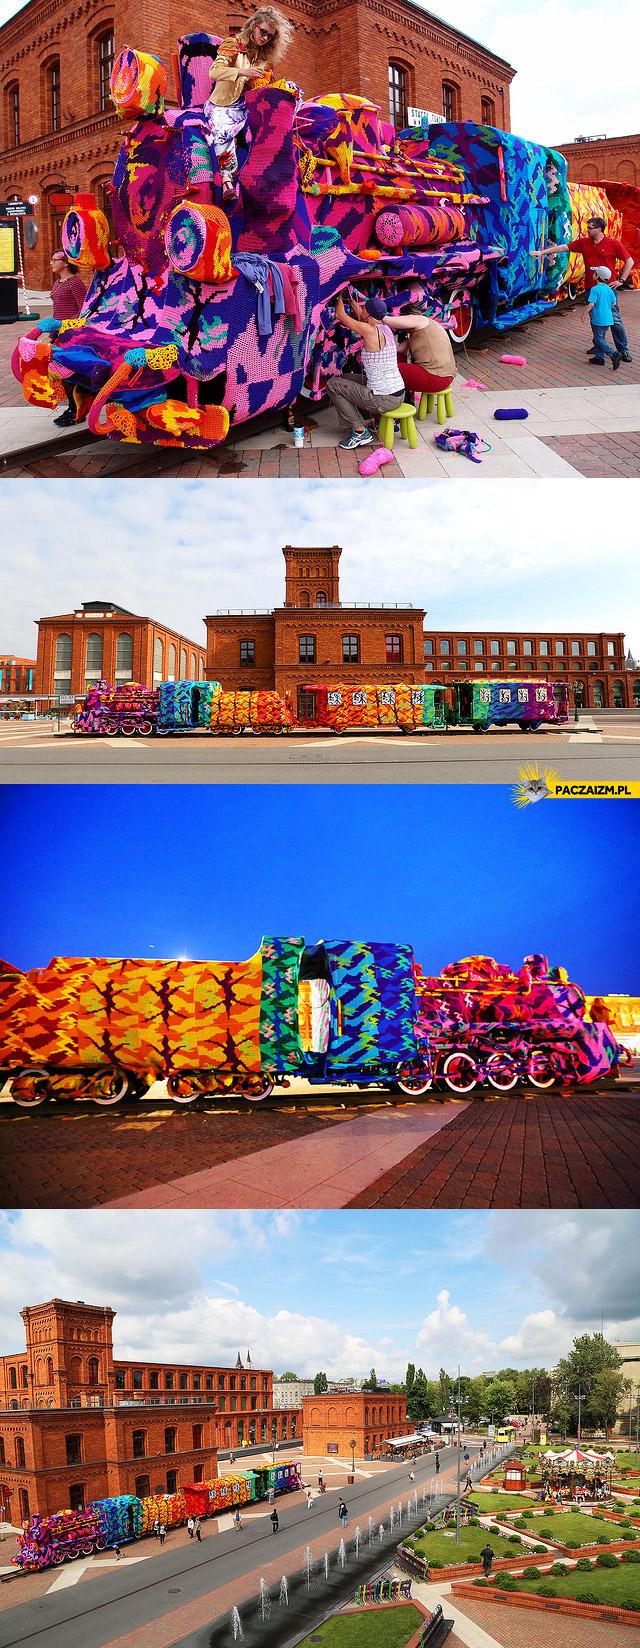 Kolorowy pociąg – Łódź Manufaktura